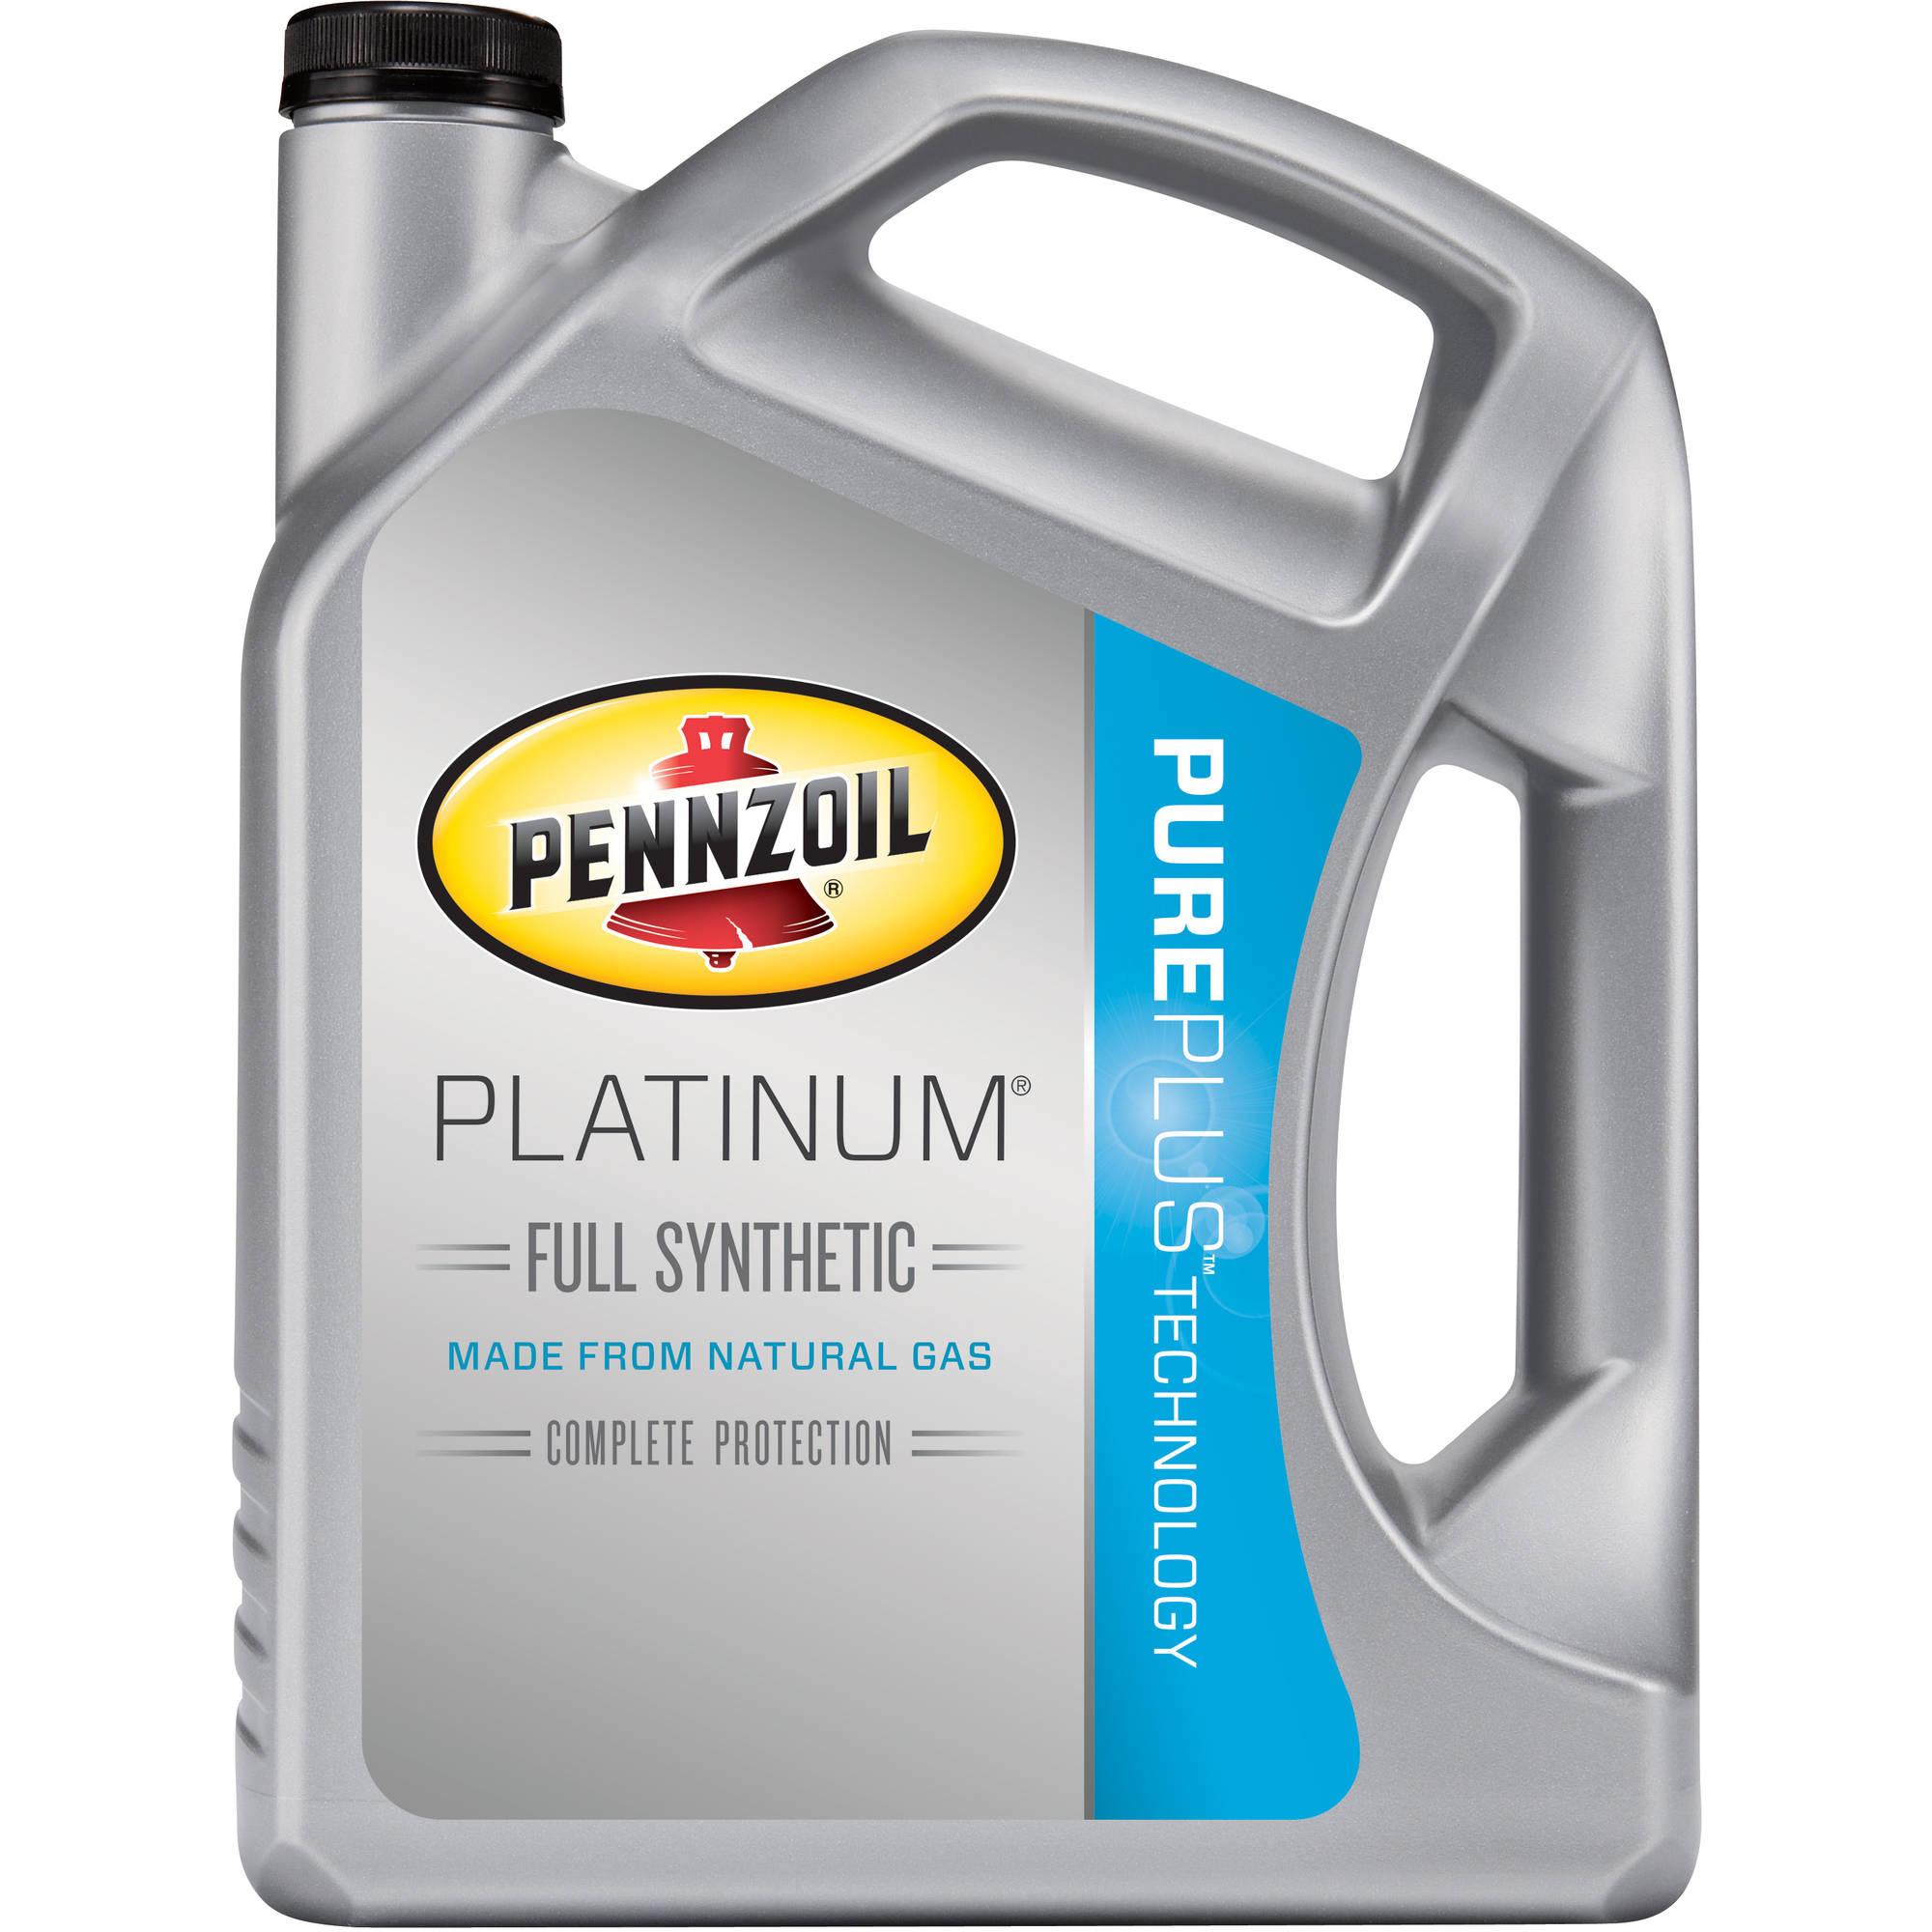 Walmart - 5Qt Pennzoil 5W20 Synthetic Oil - $22.47 + $10 MIR + $5 Ibotta app cashback w/ Free Store Pickup